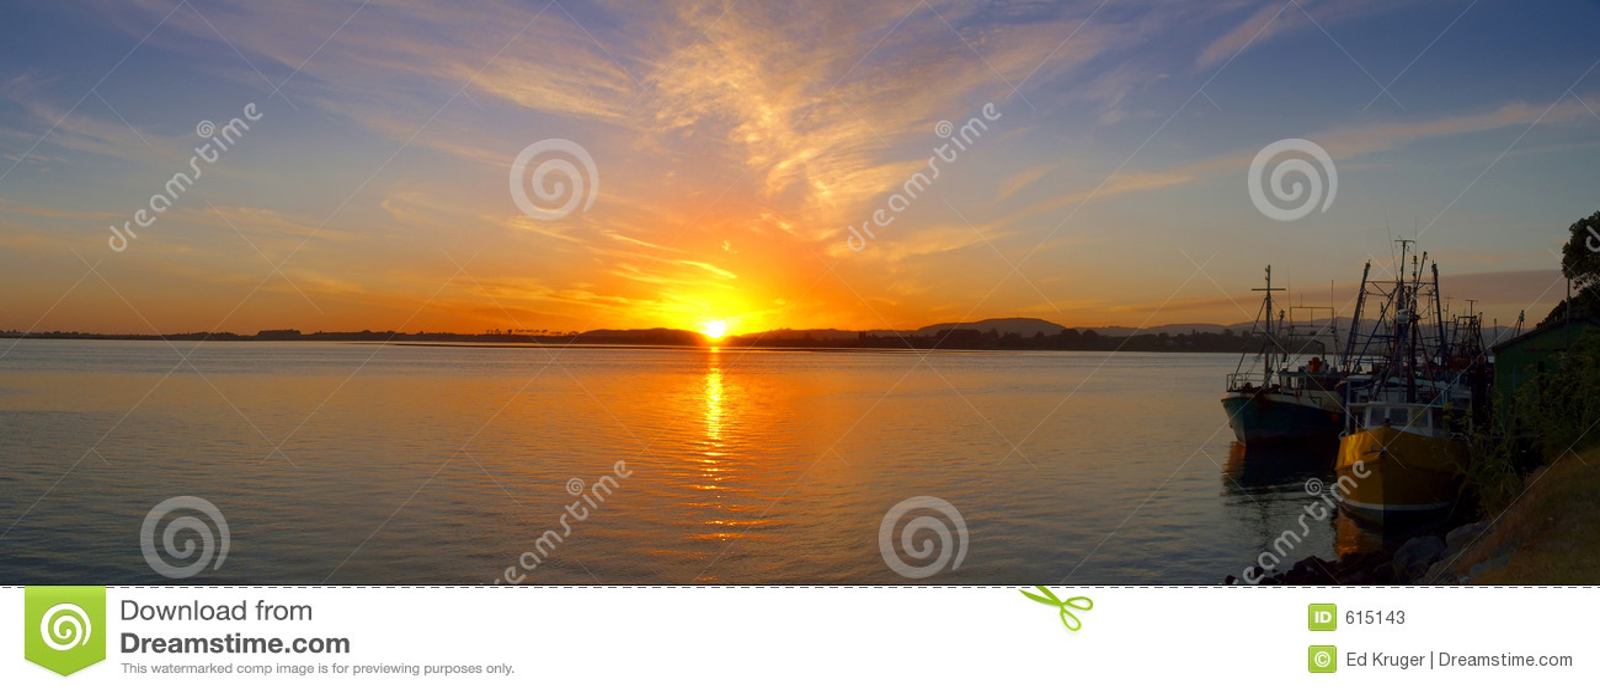 Early morning sunrise over fishing harbor